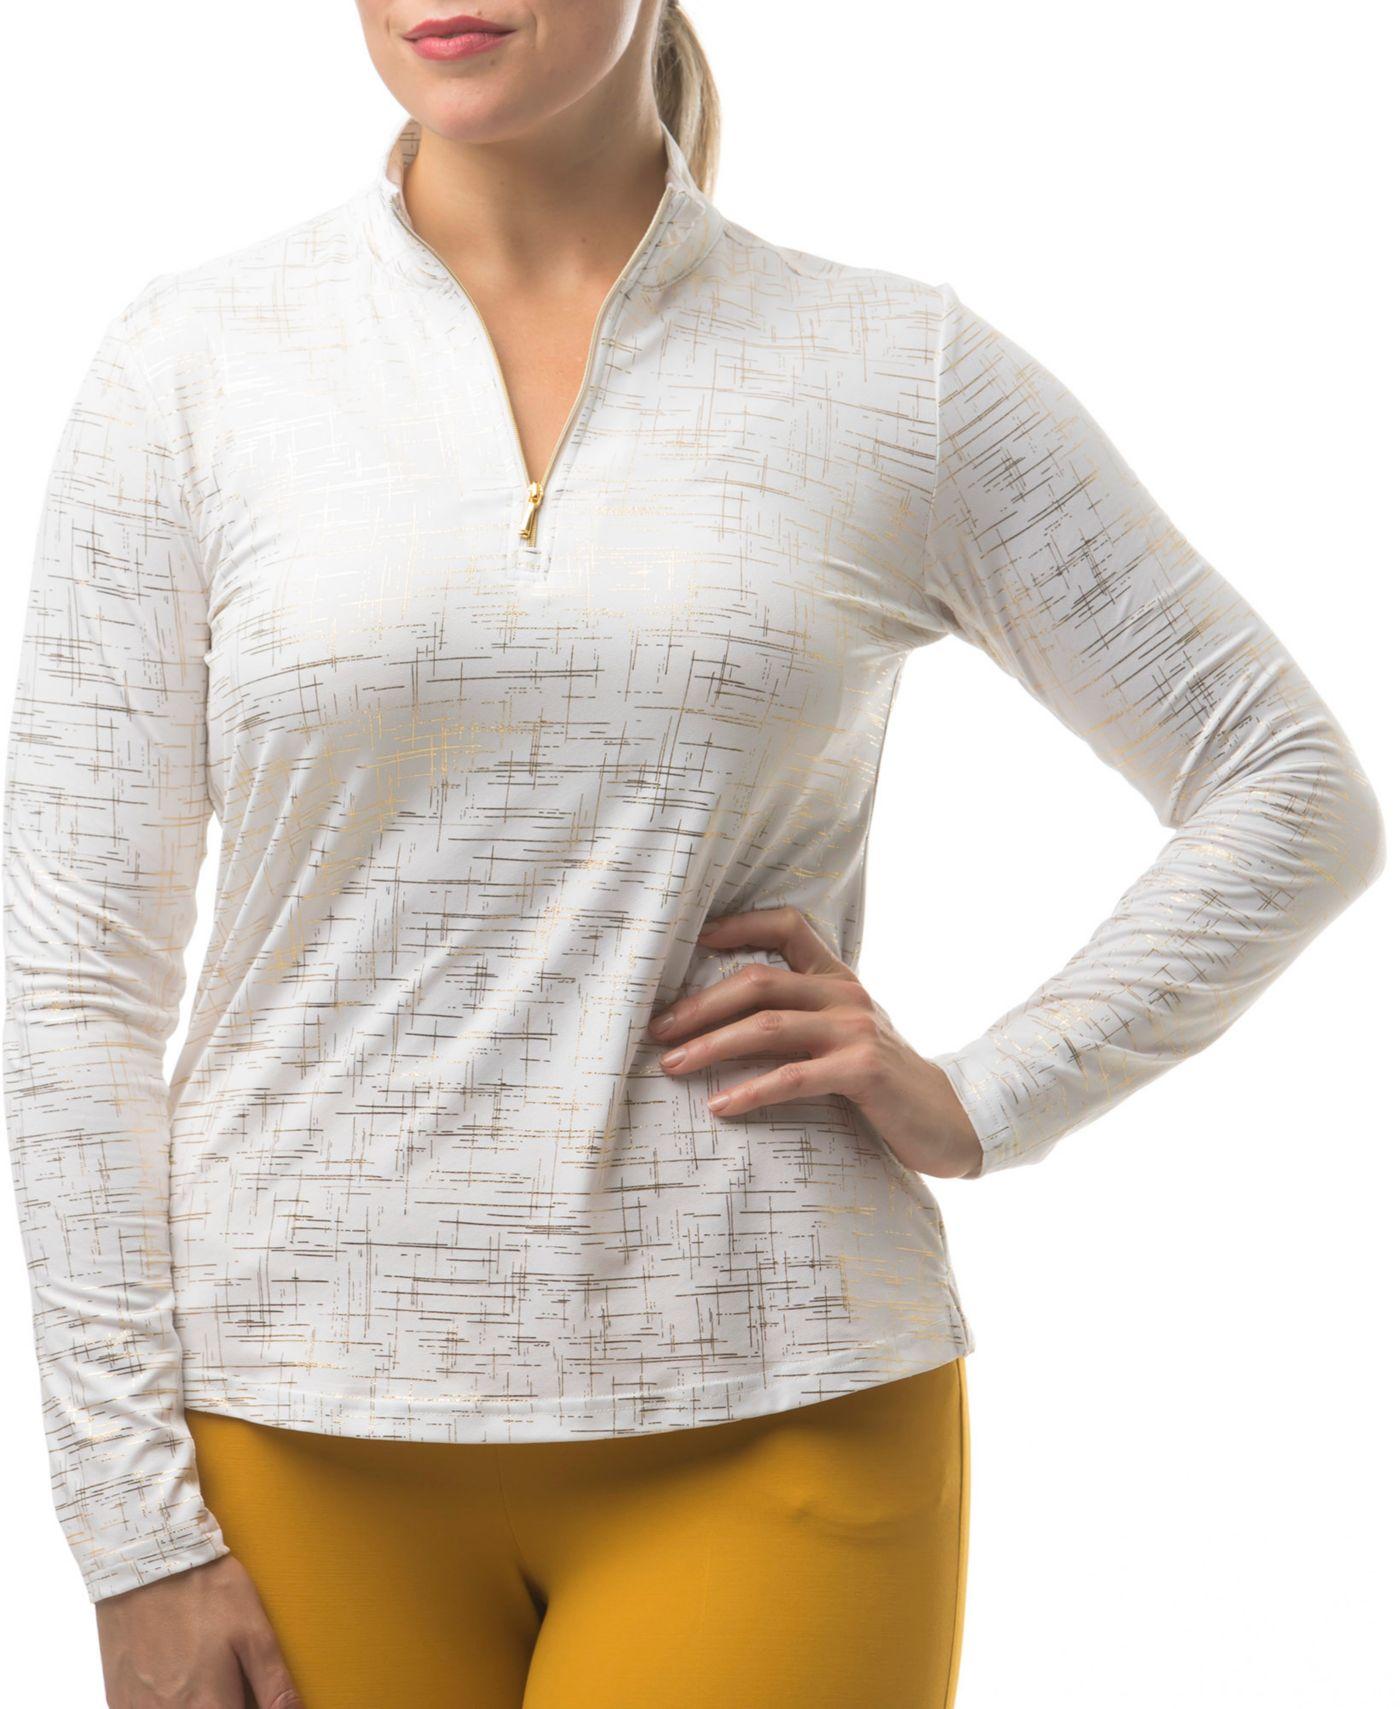 SanSoleil Women's SolShine Foil Print ¼-Zip Golf Pullover